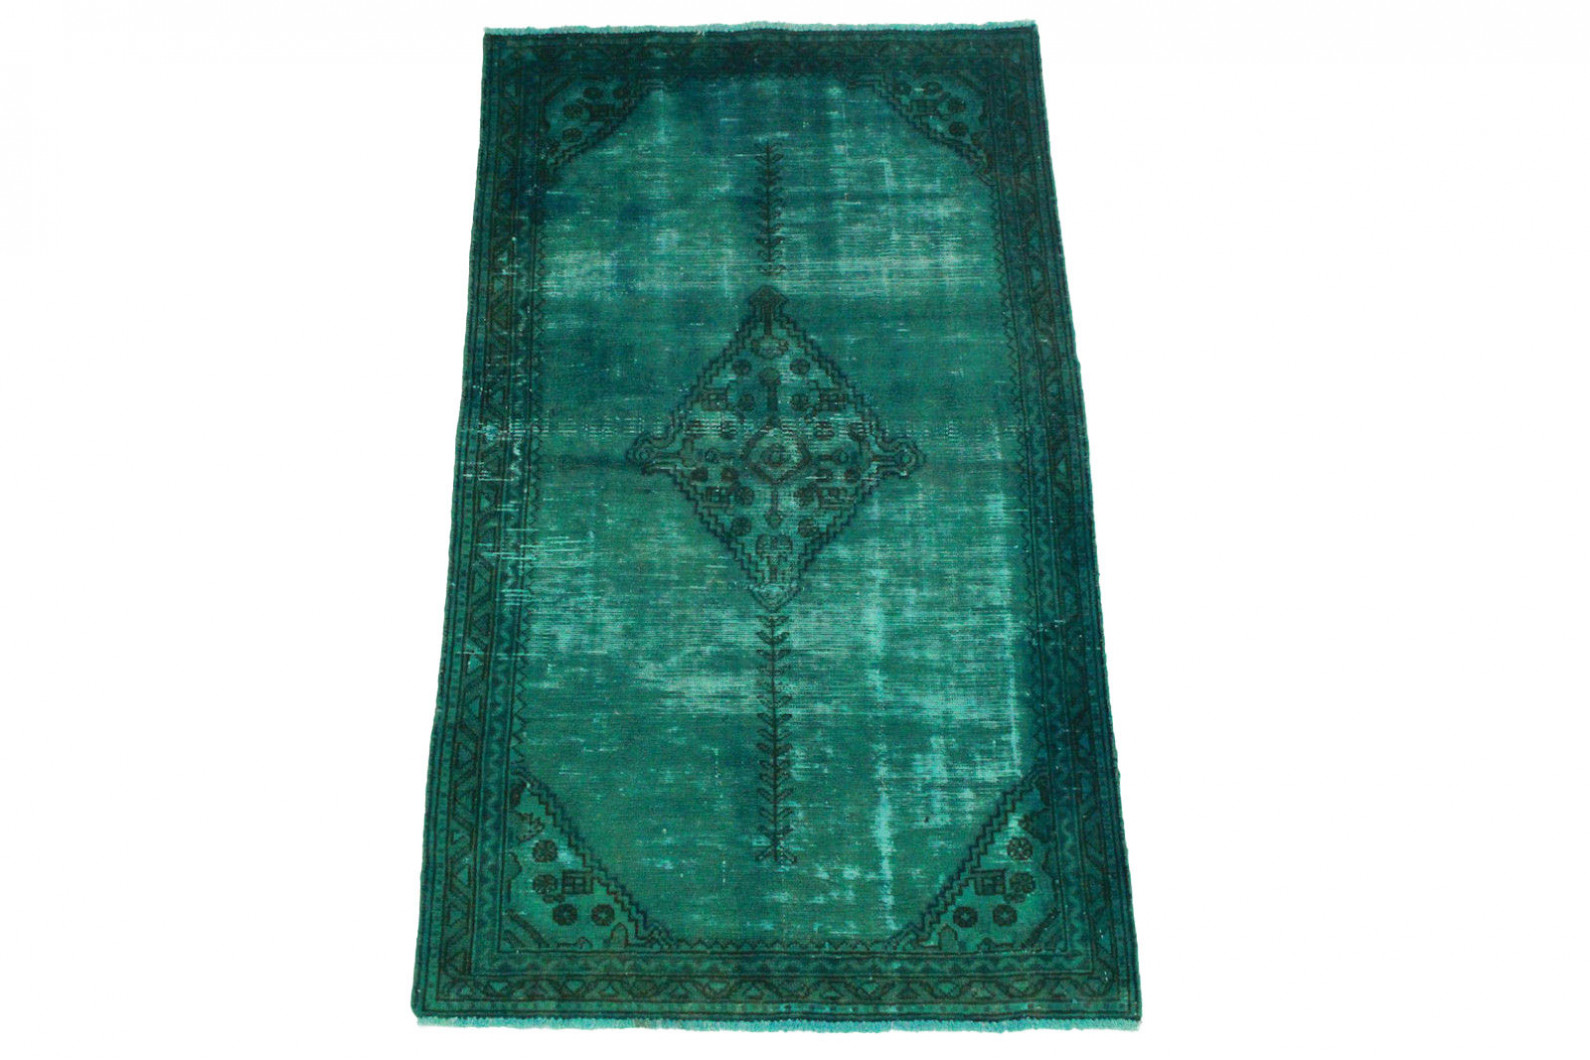 vintage teppich blau t rkis in 170x100cm 1001 3230 bei. Black Bedroom Furniture Sets. Home Design Ideas